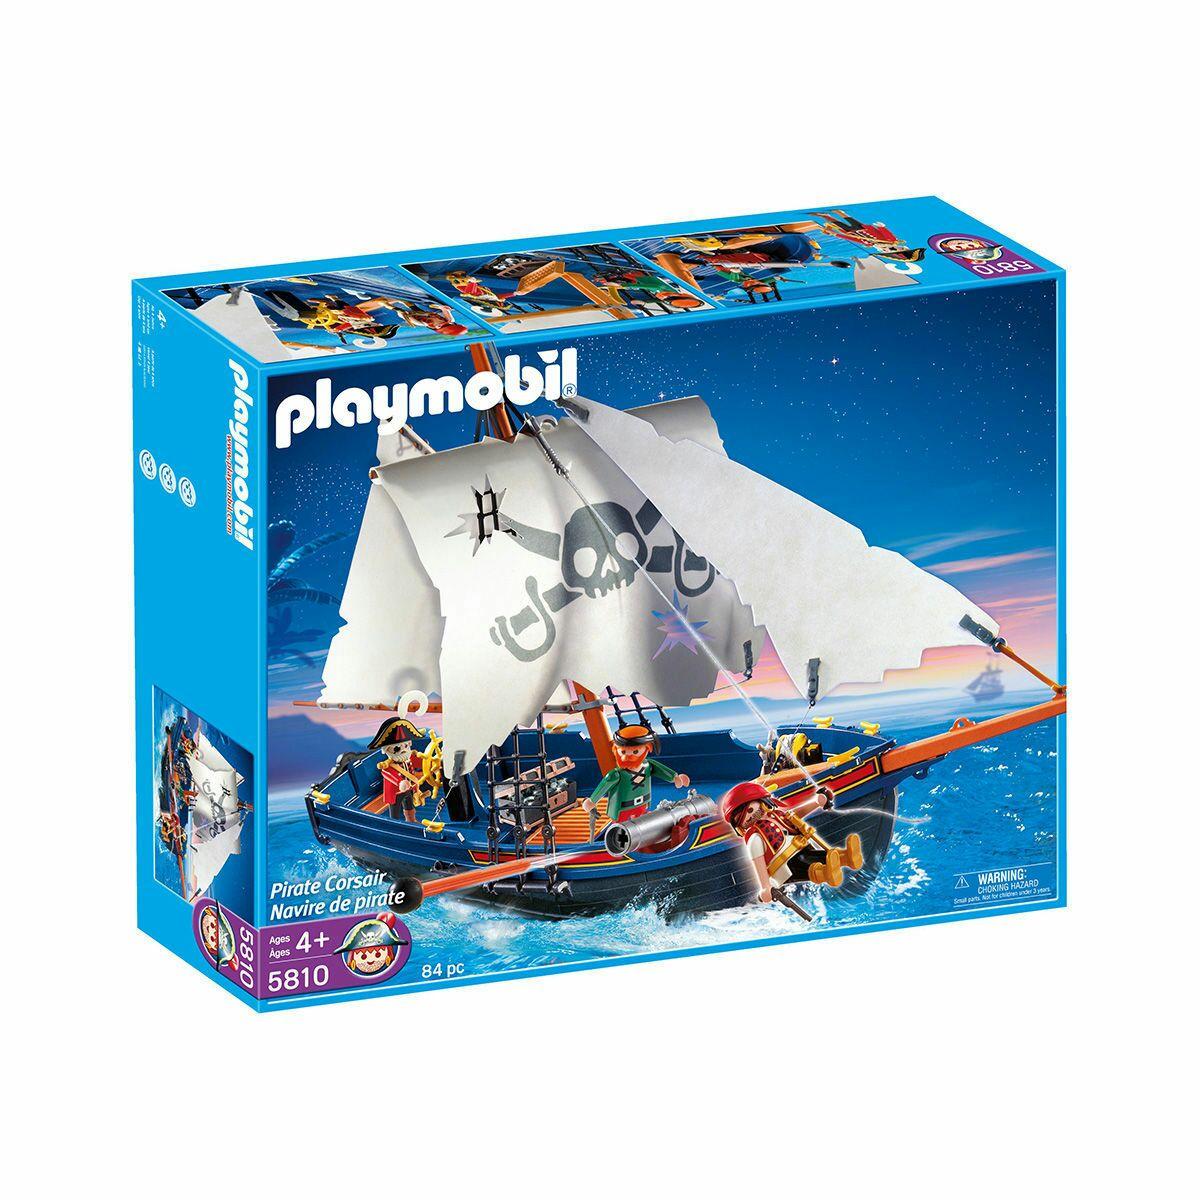 Playmobil Piratenschiff 5810 (29,99), Forsthaus (19,99), Karstadt abholung